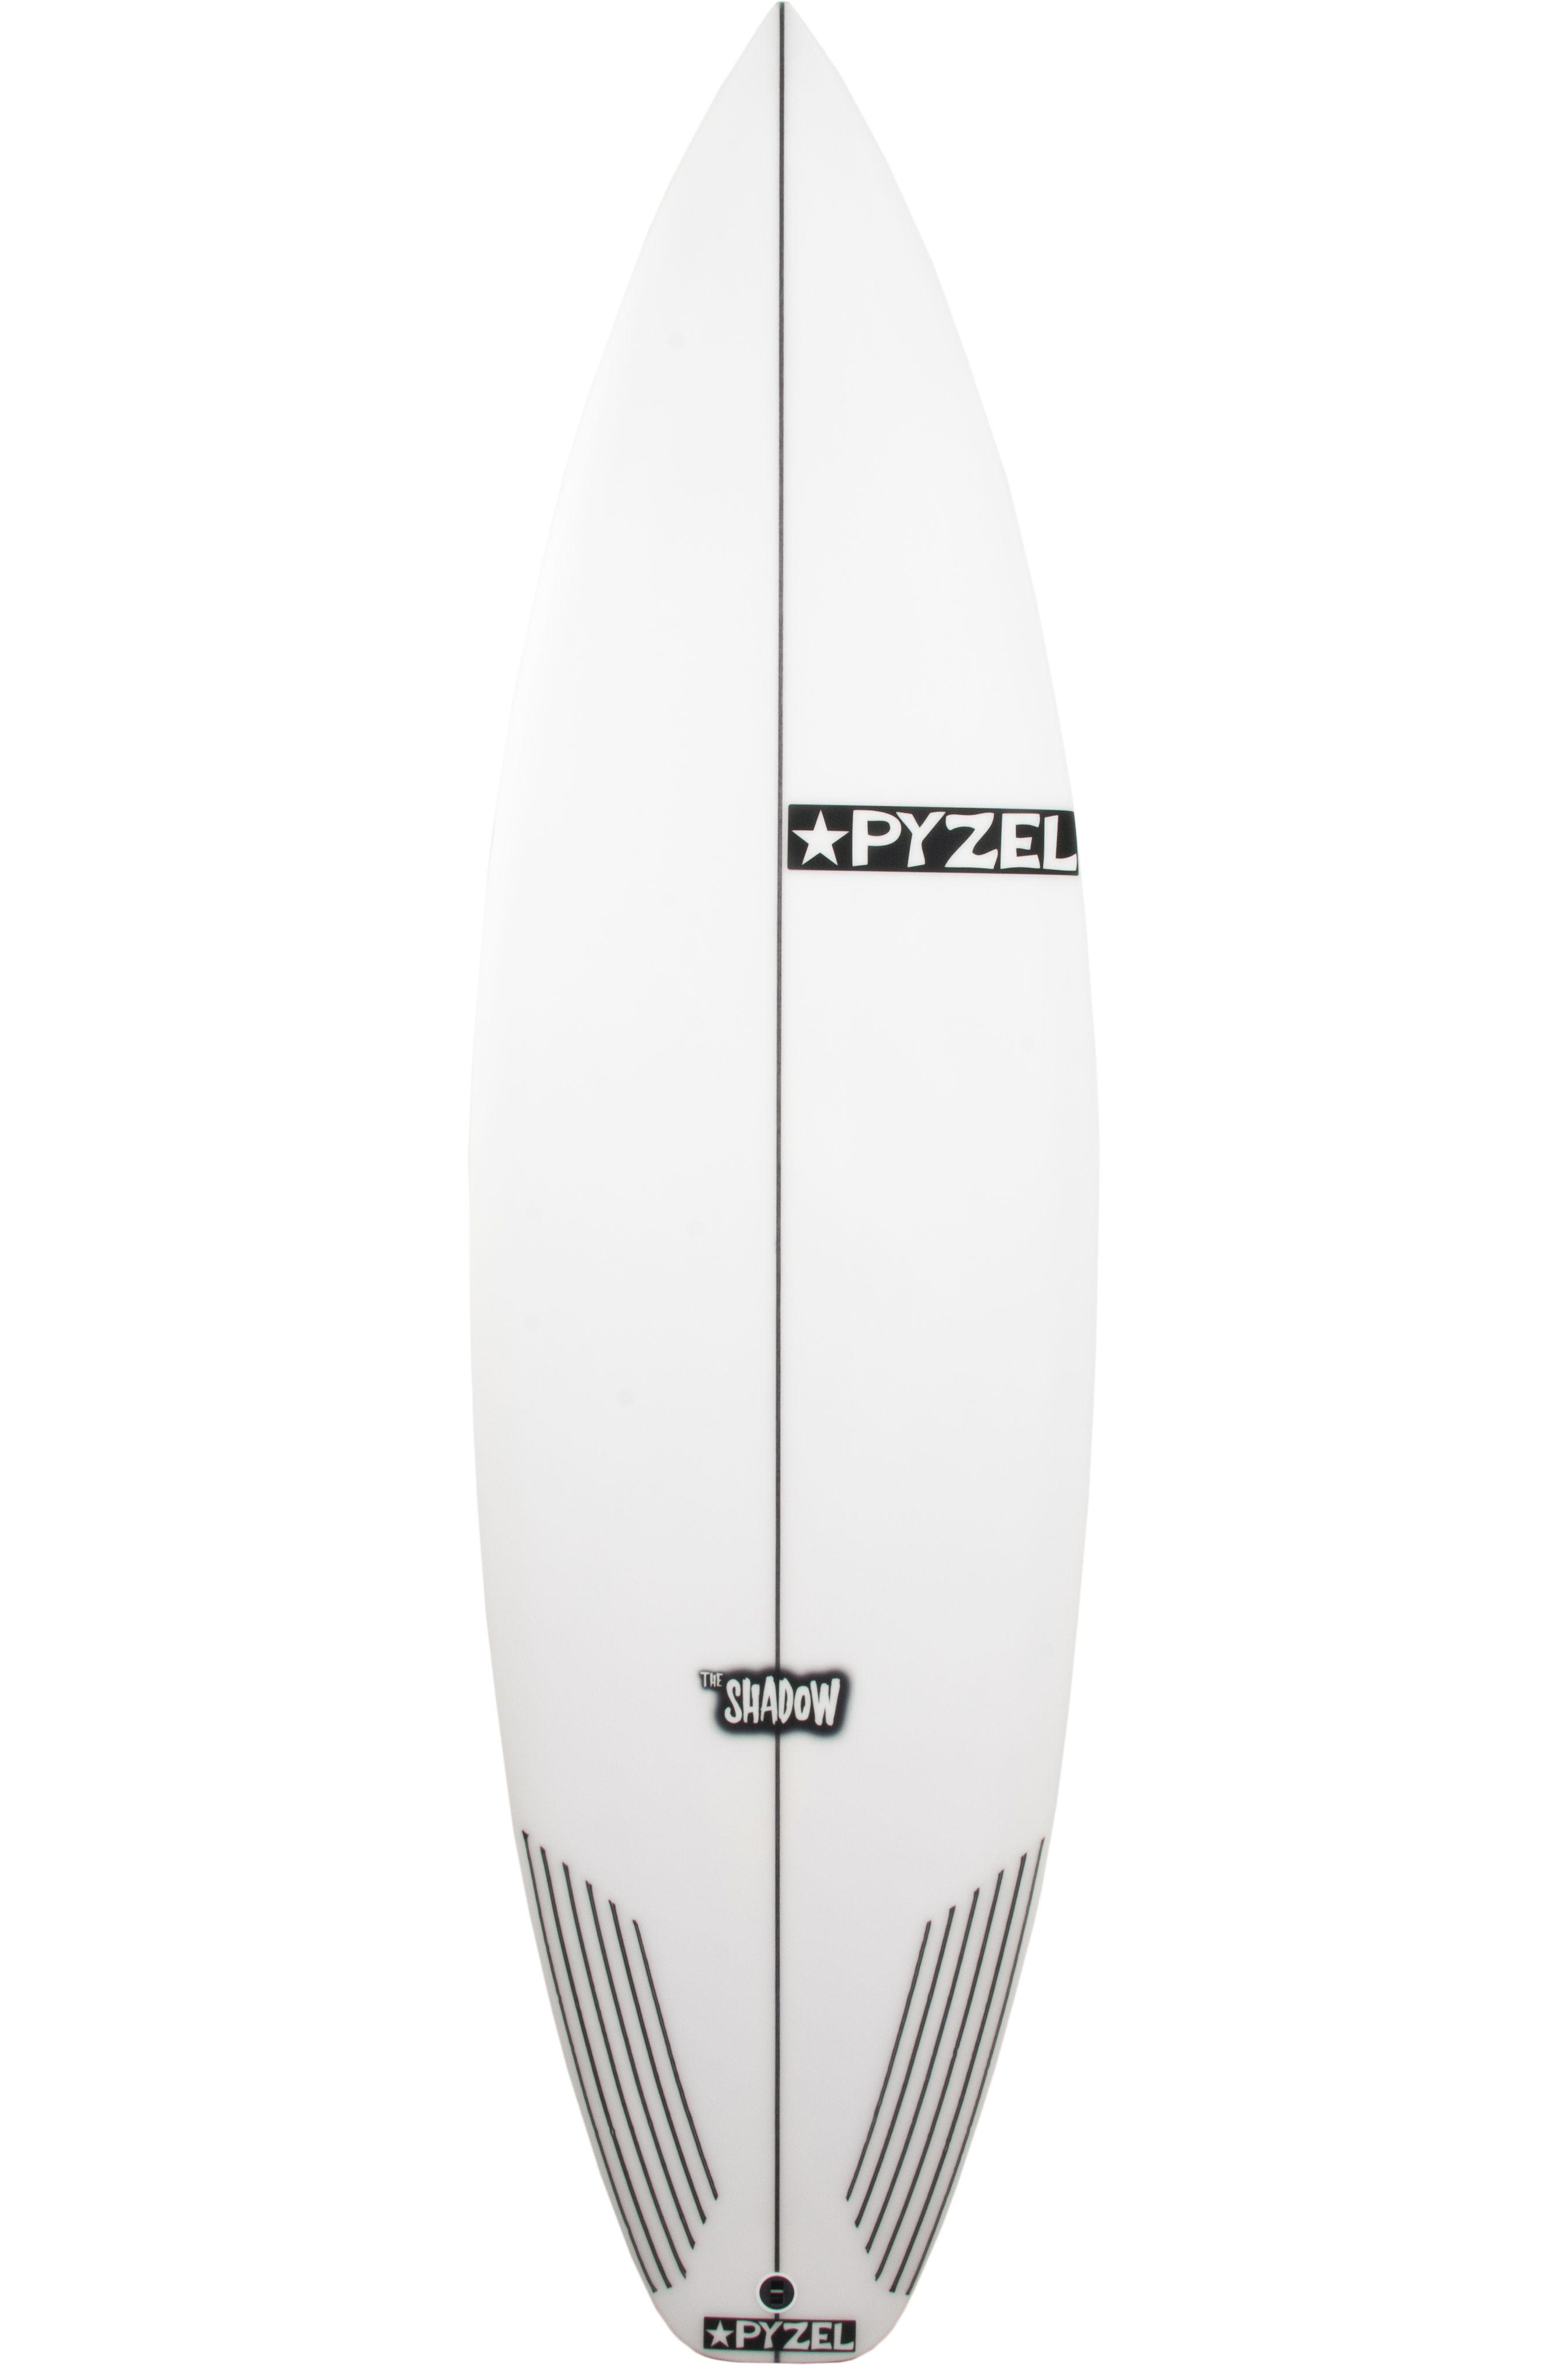 Prancha Surf Pyzel 6'4 SHADOW Squash Tail - White FCS II 6ft4